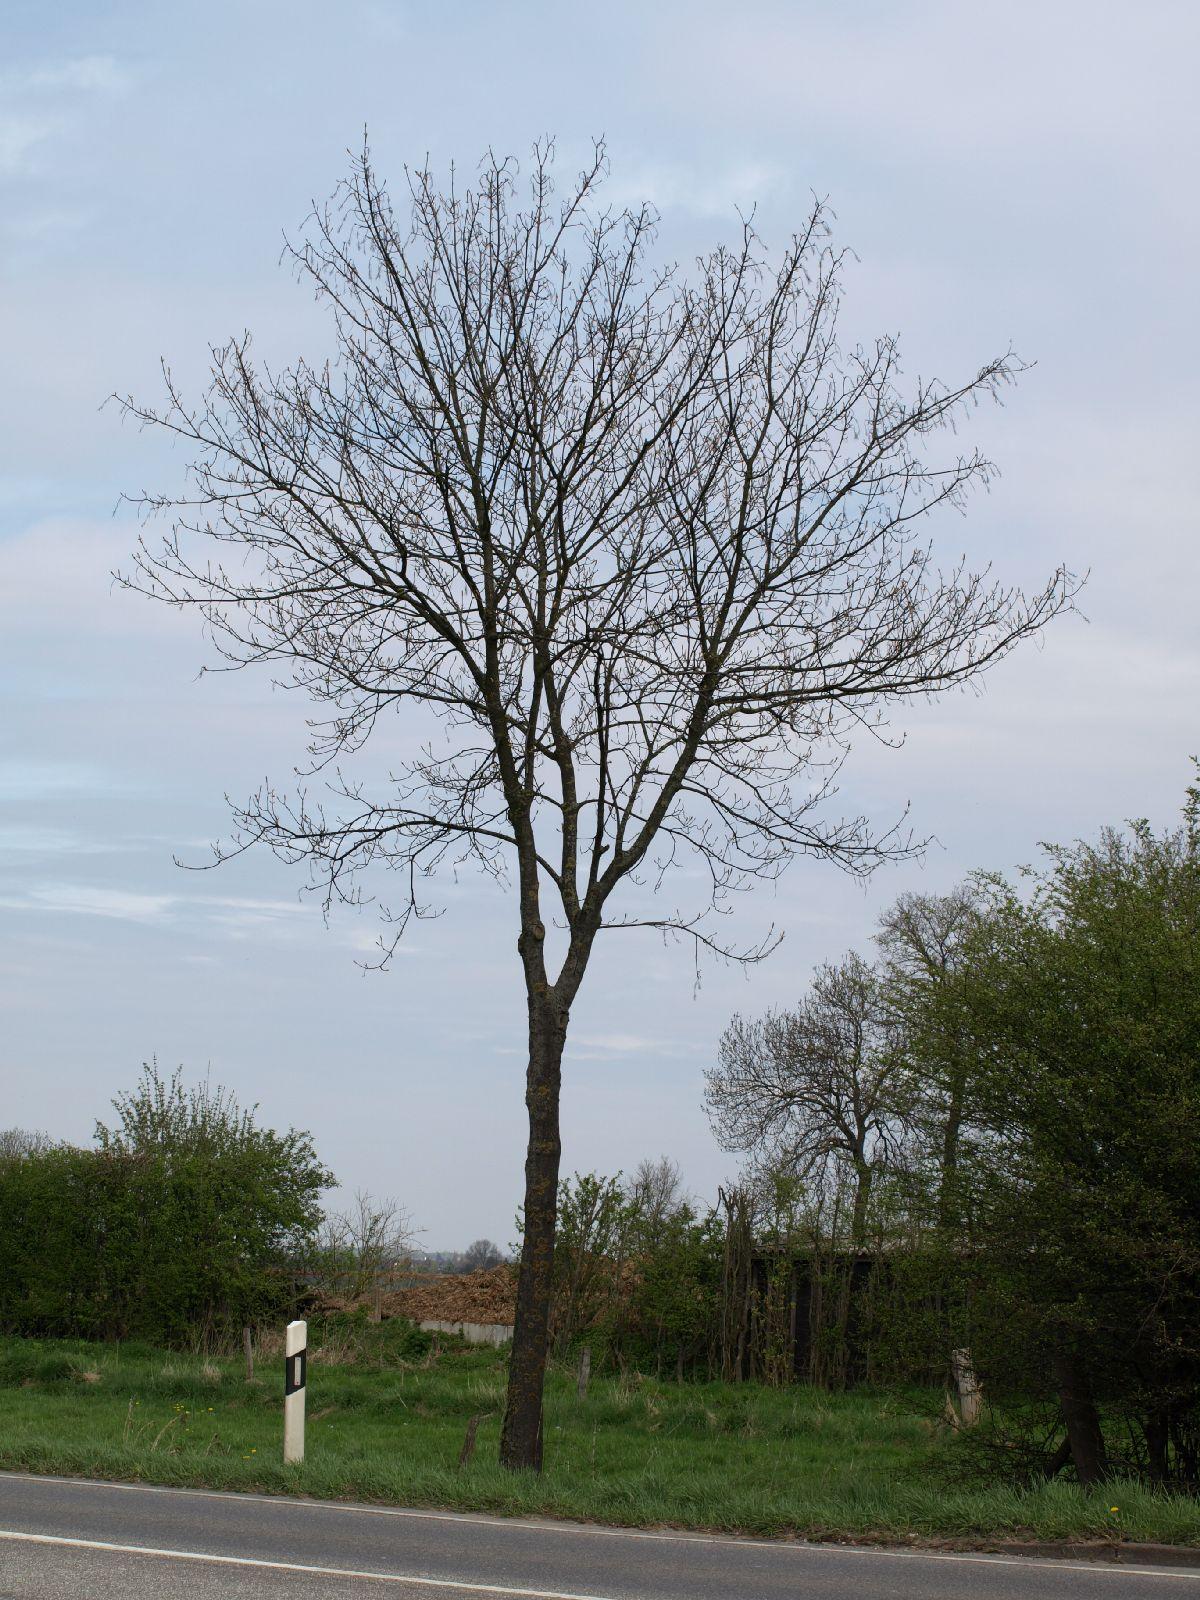 Pflanzen-Baum-Silhouette-Foto_Textur_B_P4261828